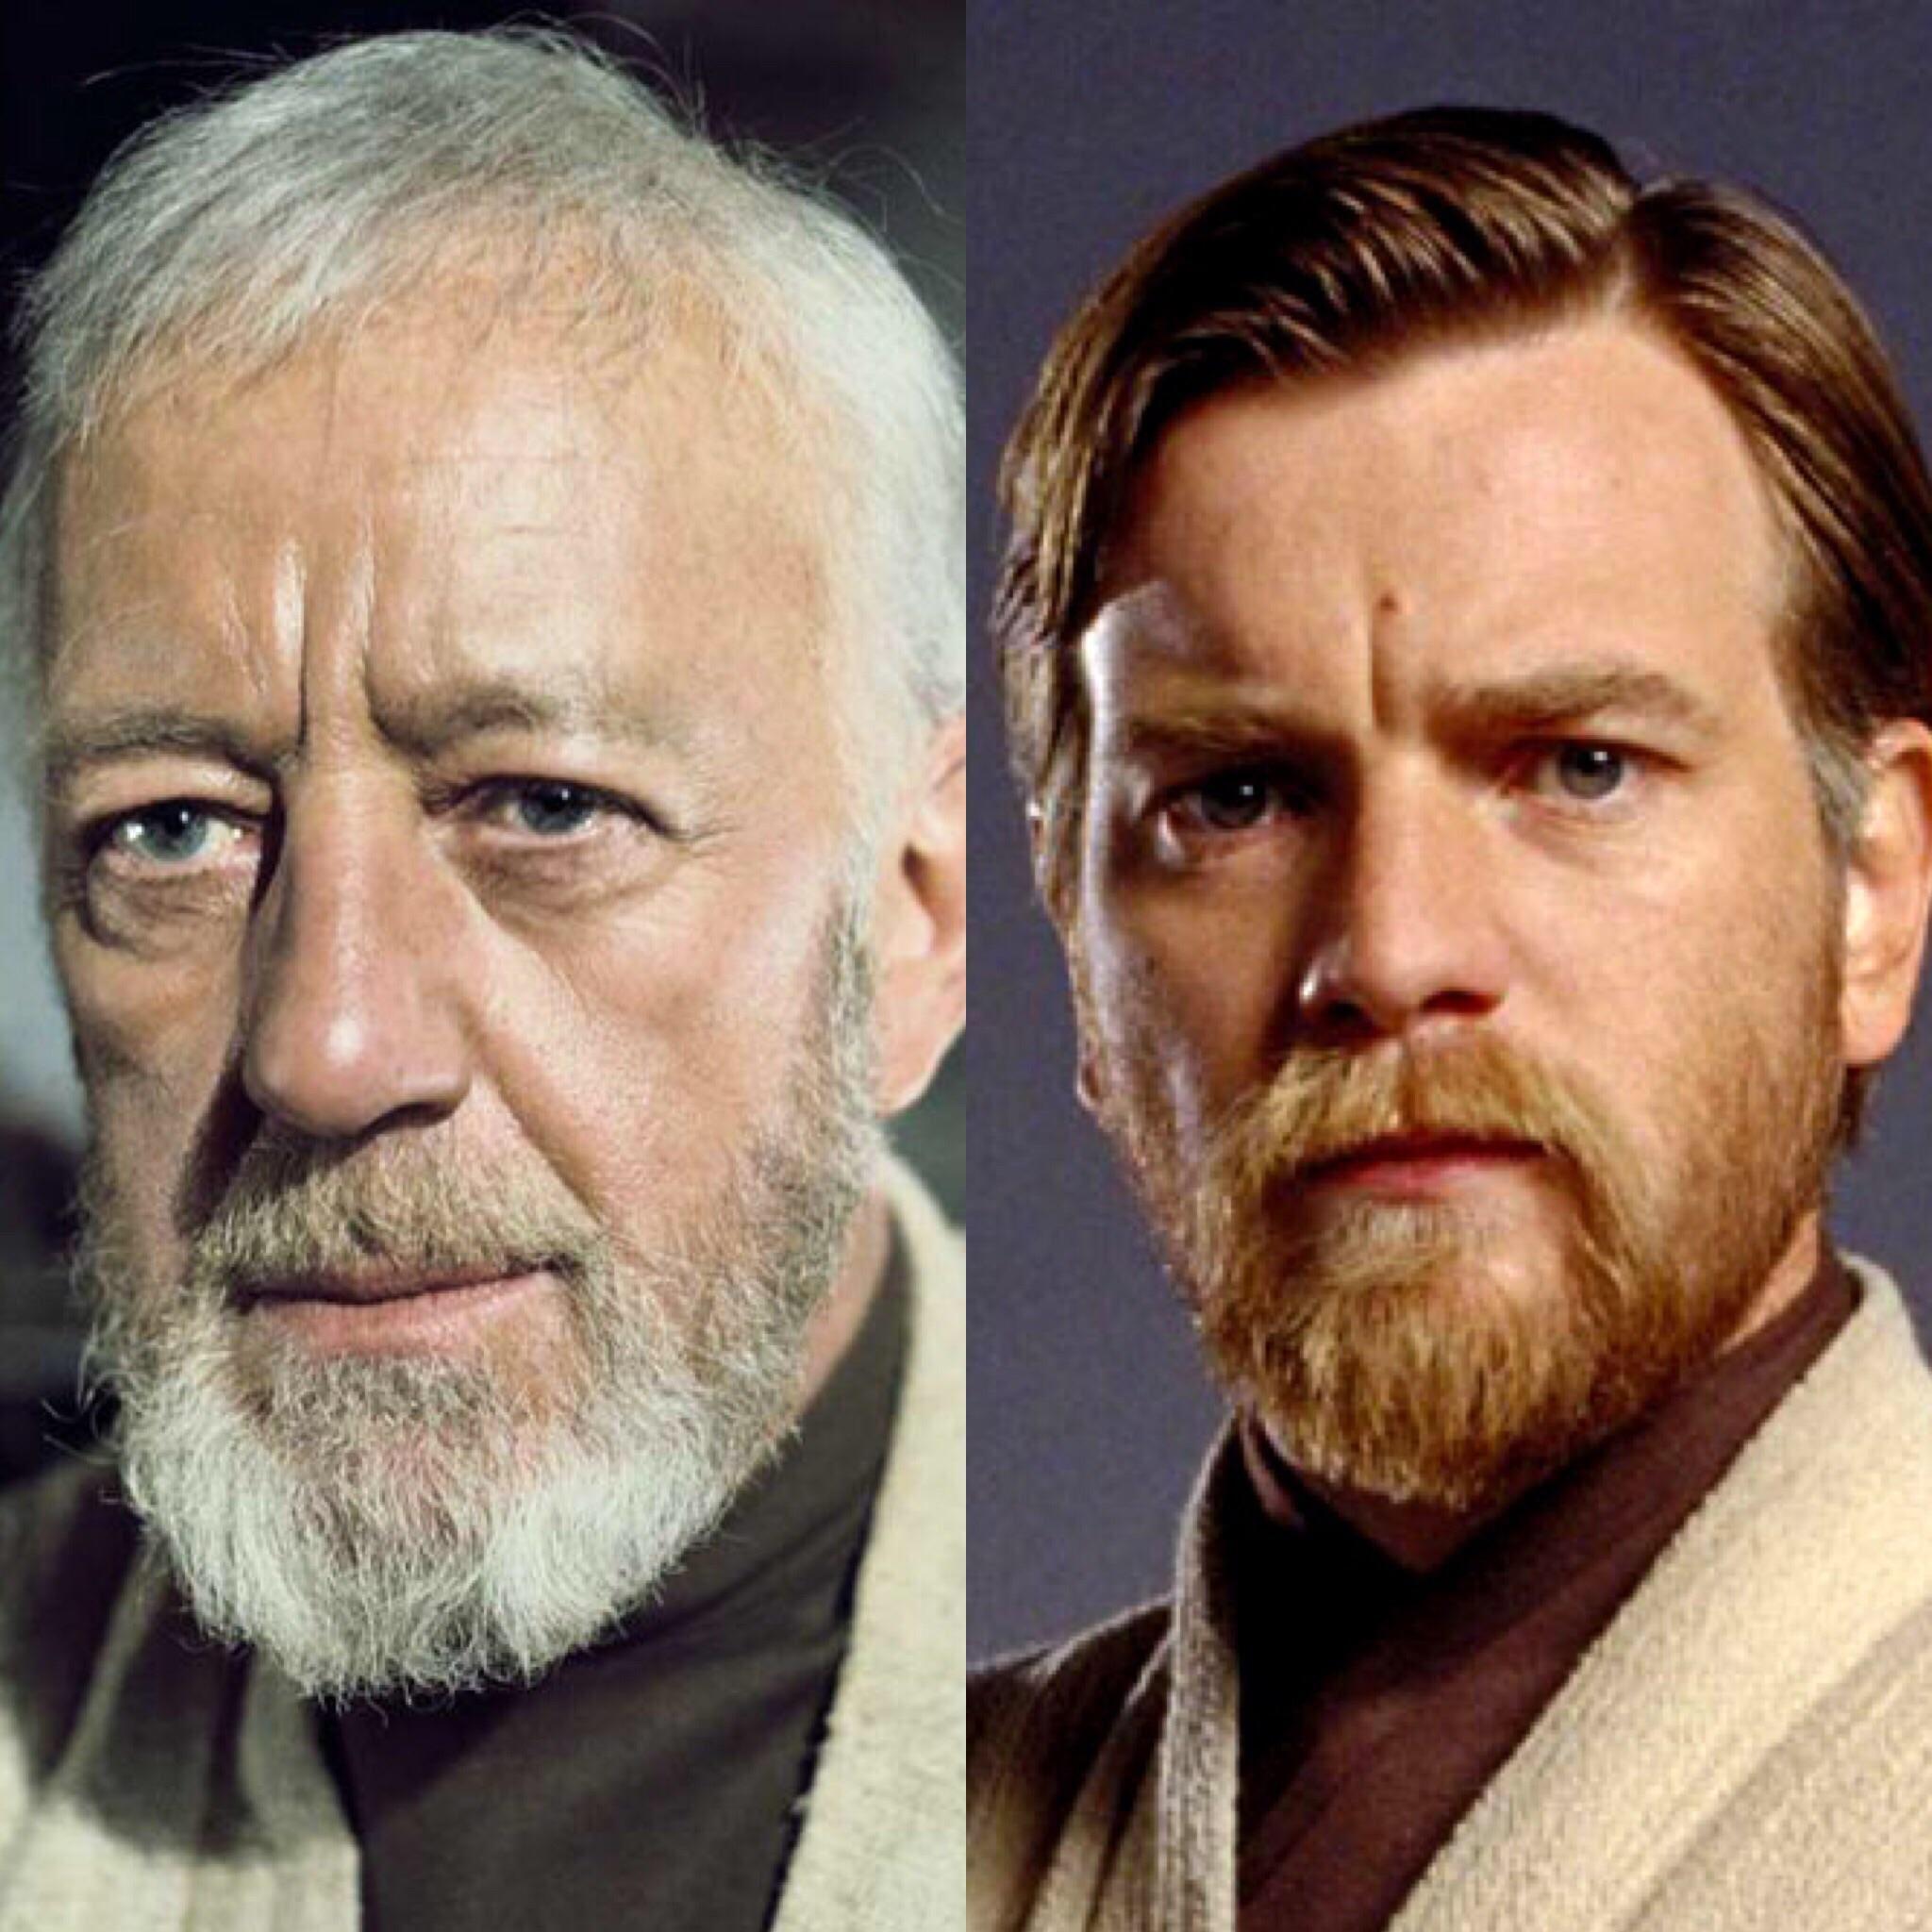 Obi Wan Kenobi Star Wars Film Legende Alec Guinness Herren Alle Größen